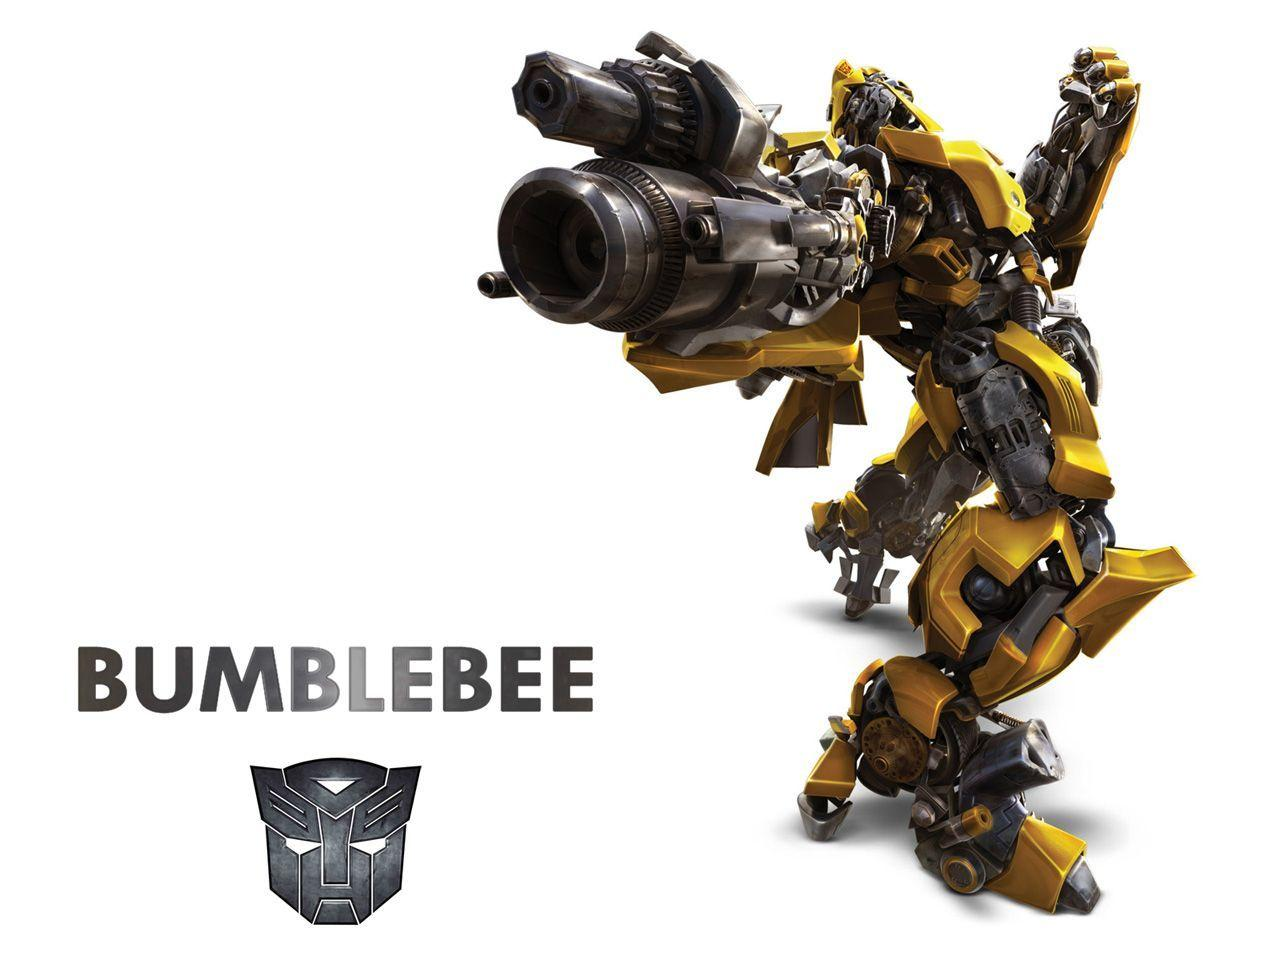 bumblebee transformers wallpapers wallpaper cave